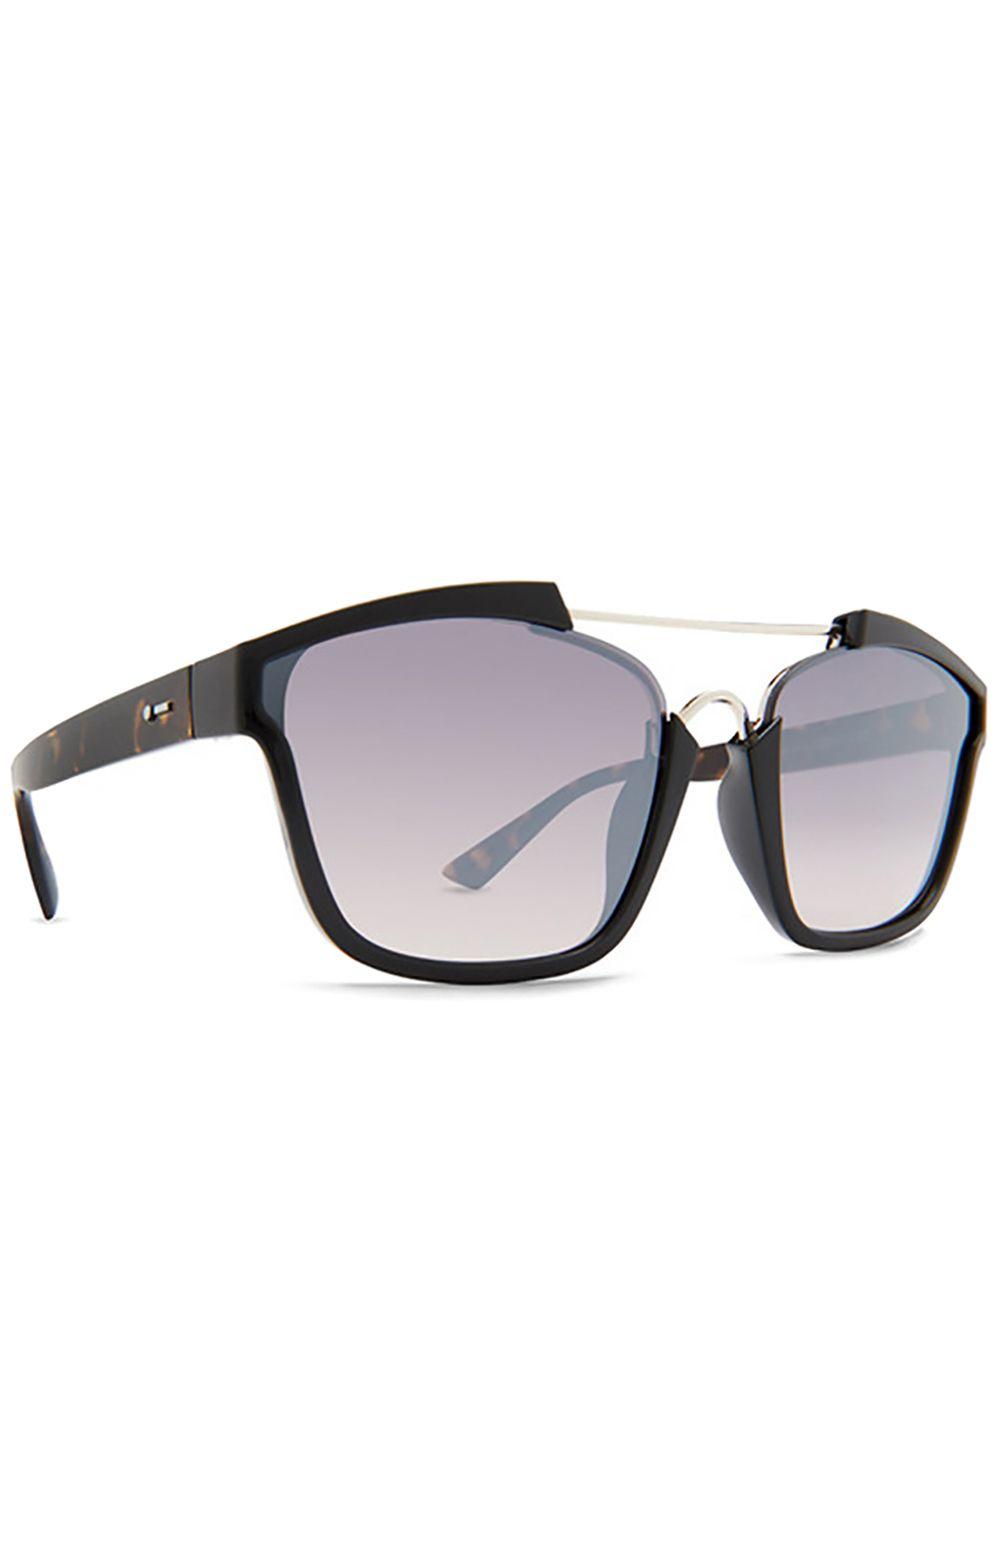 Oculos Dot Dash CONFUEGO Shadow Tort Gloss / Silver